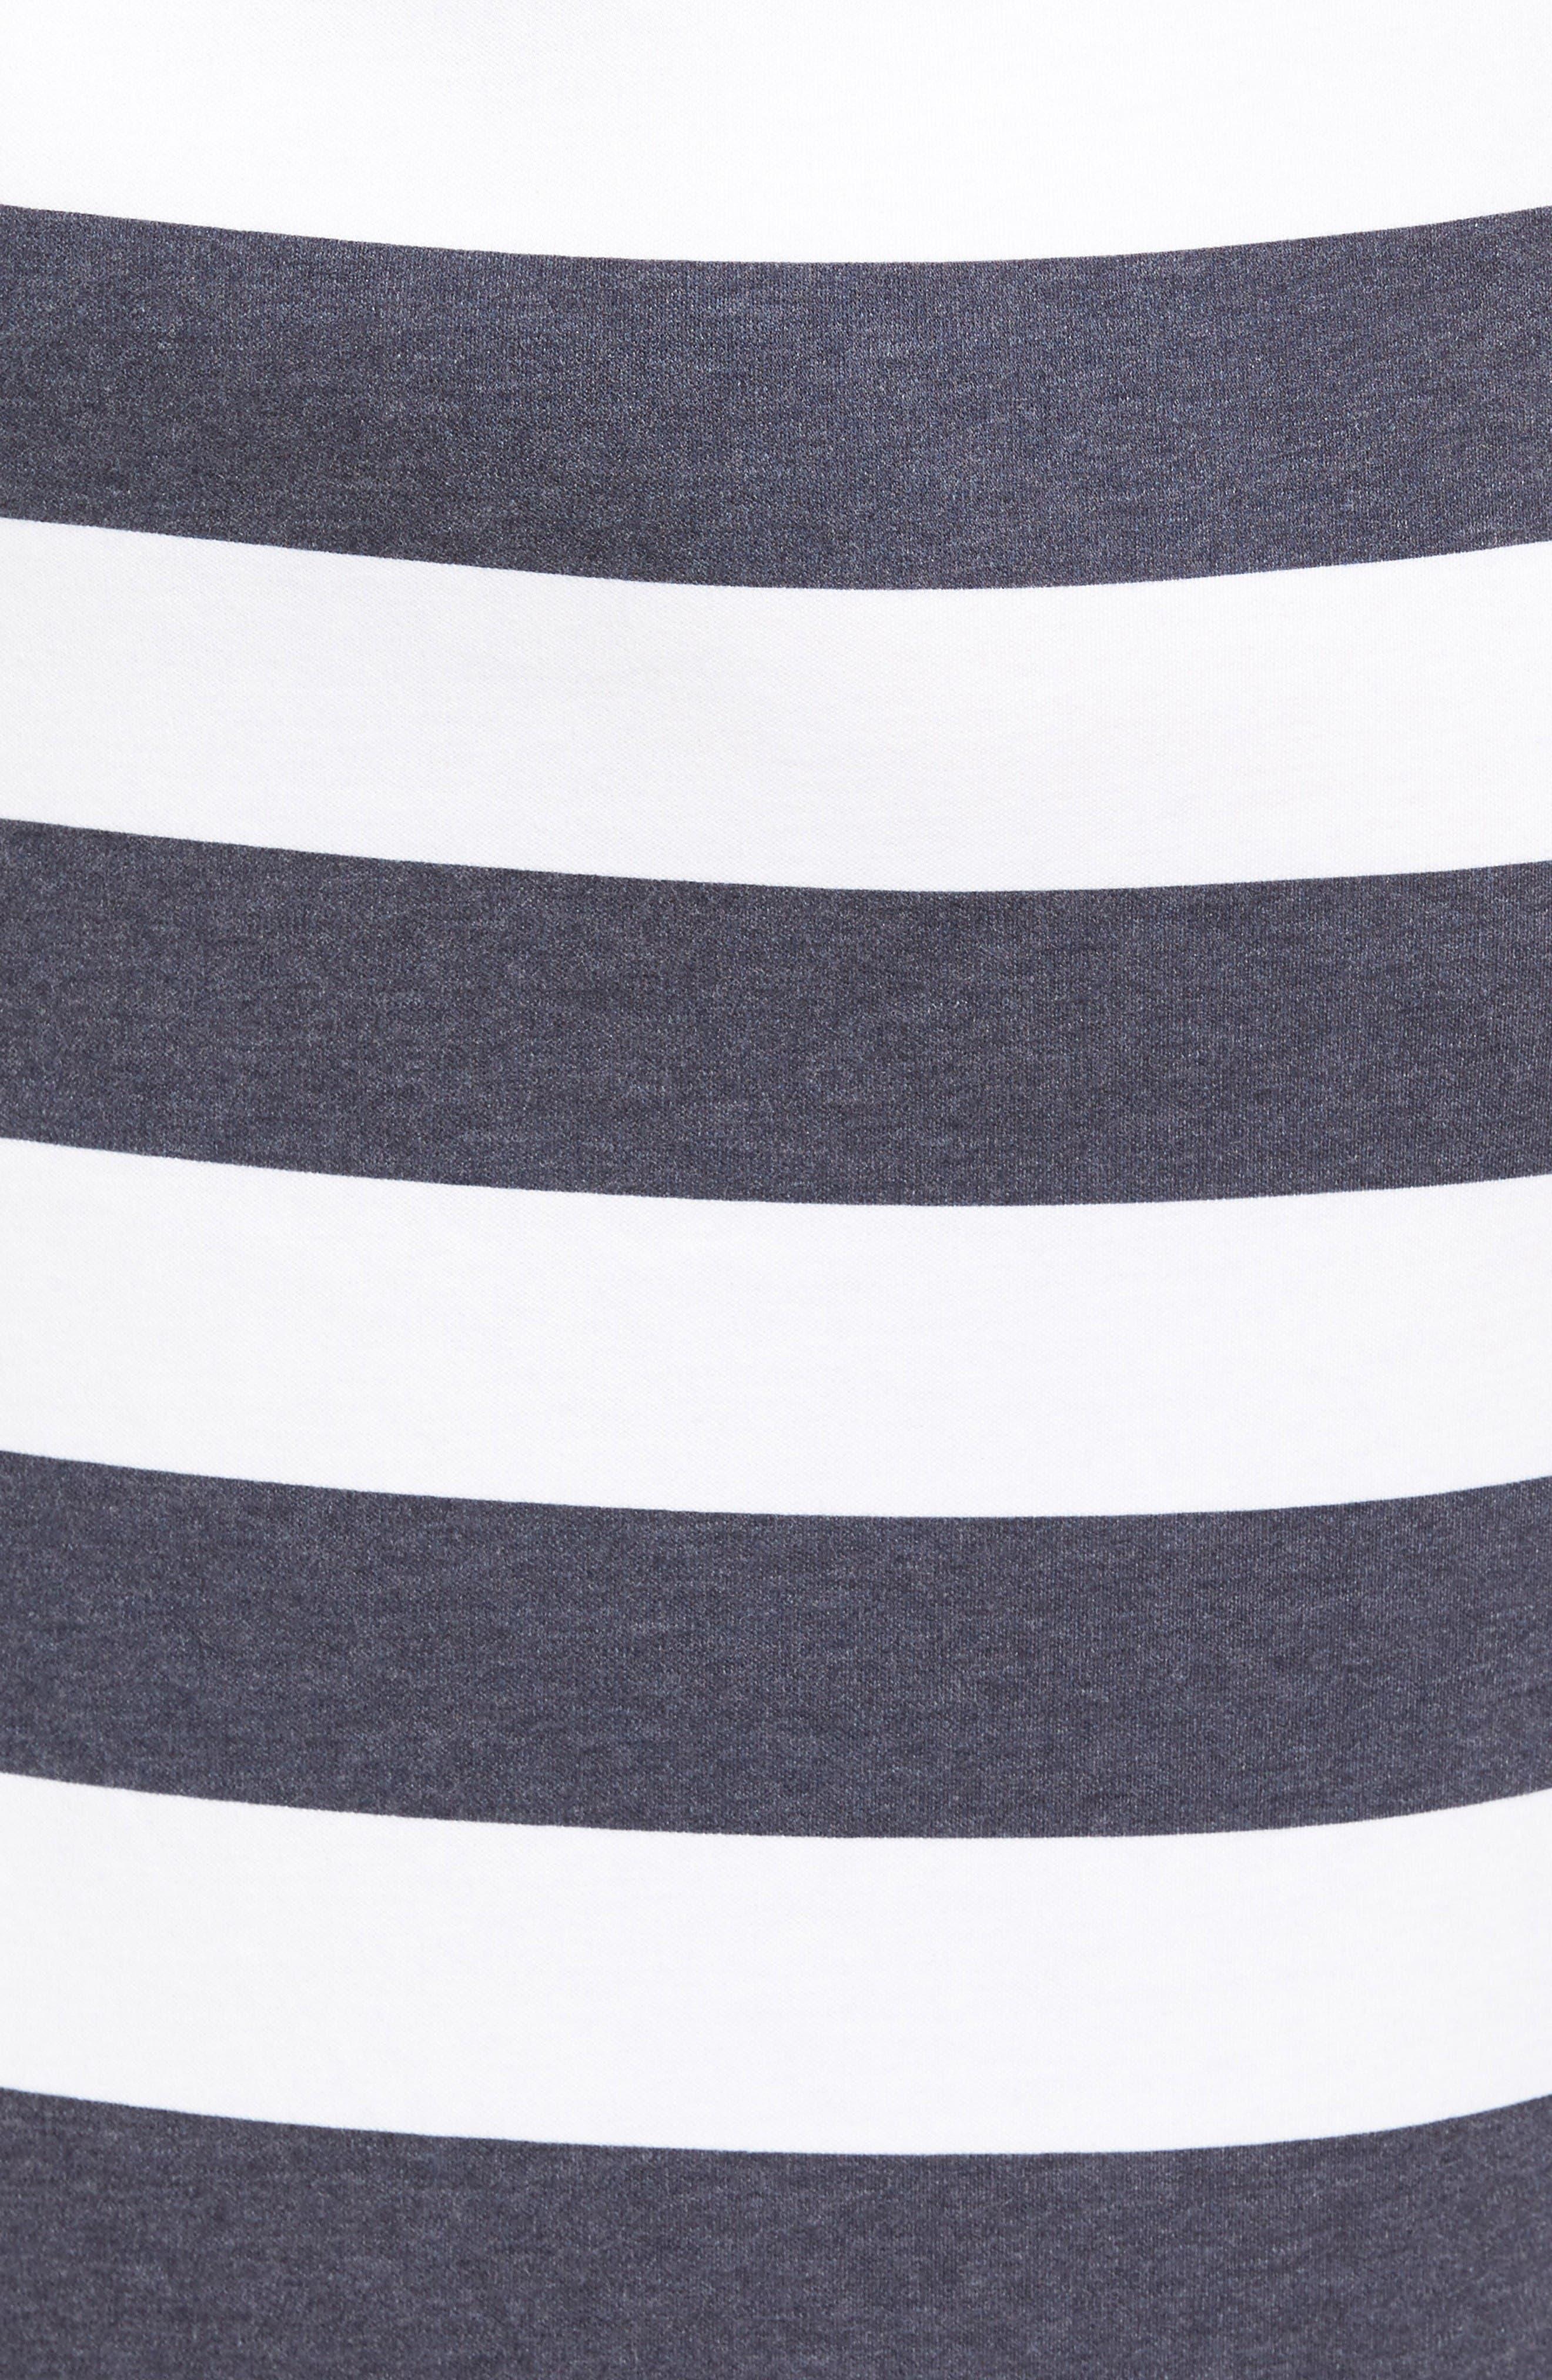 Alternate Image 5  - MICHAEL Michael Kors Rugby Stripe Tank Maxi Dress (Regular & Petite)